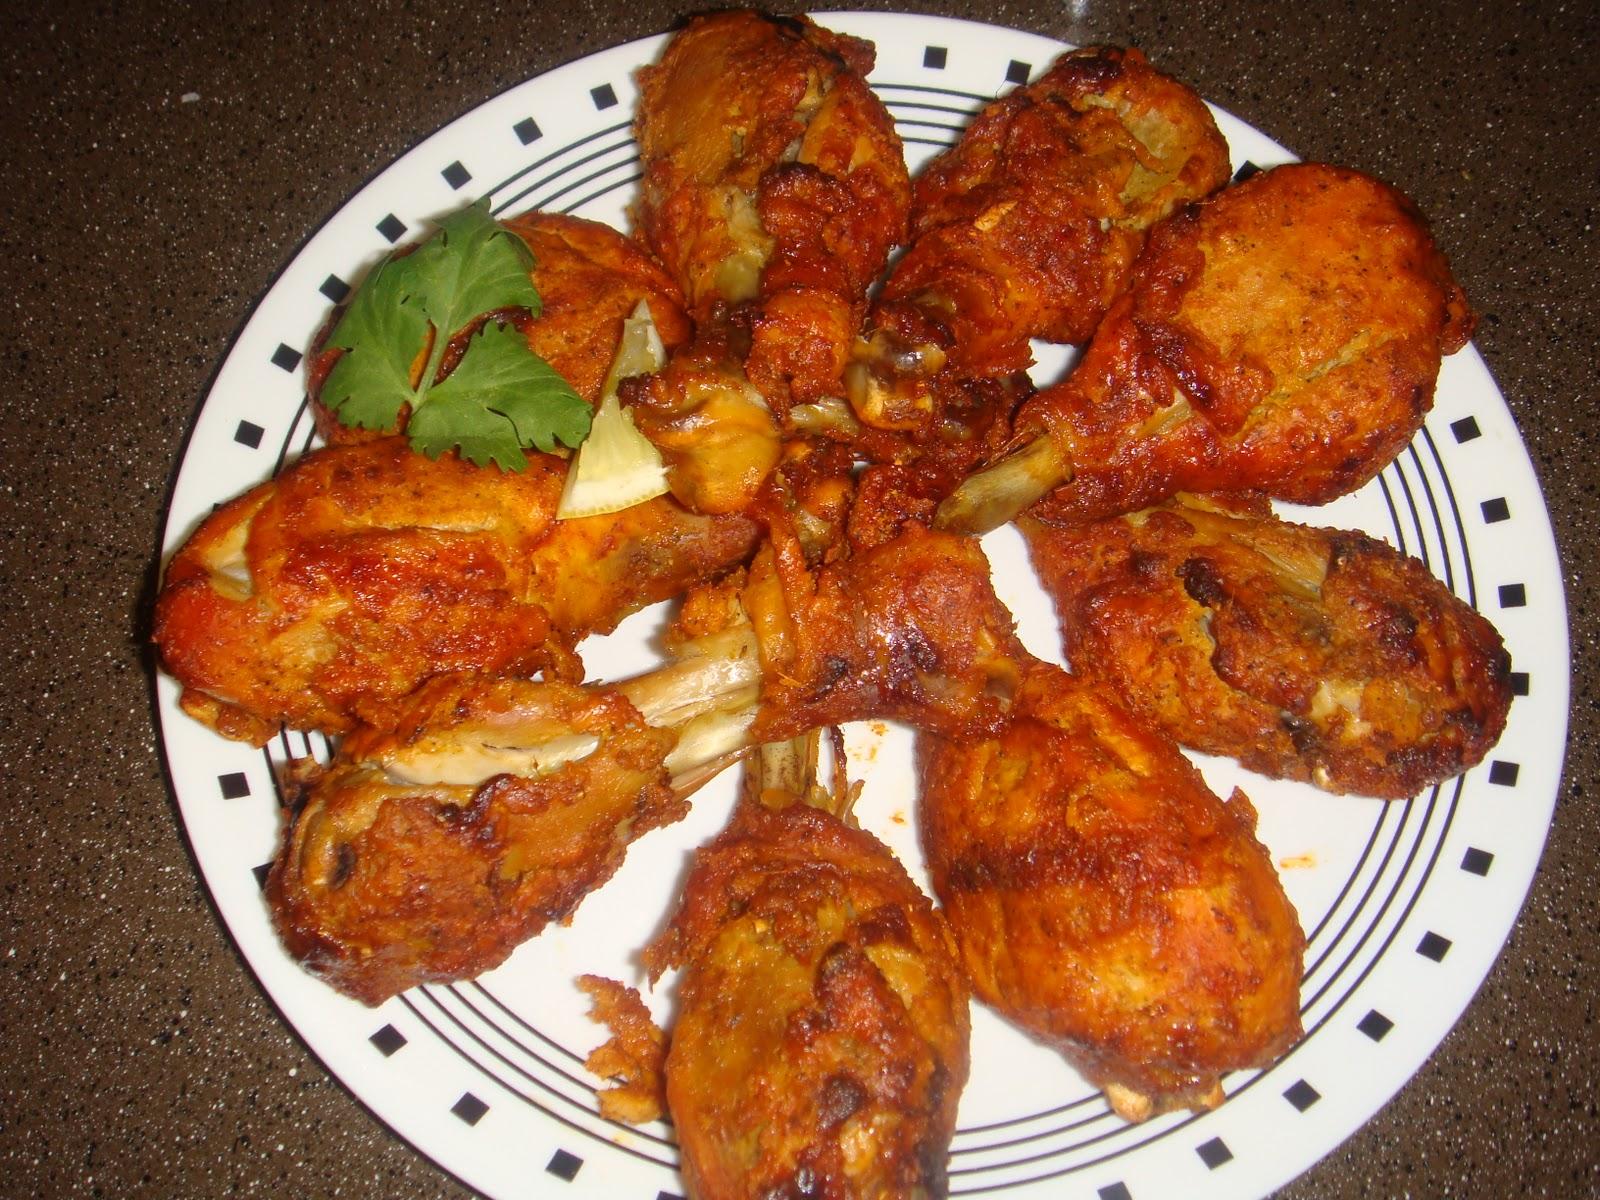 Tandoori kitchen - Chicken Tandoori